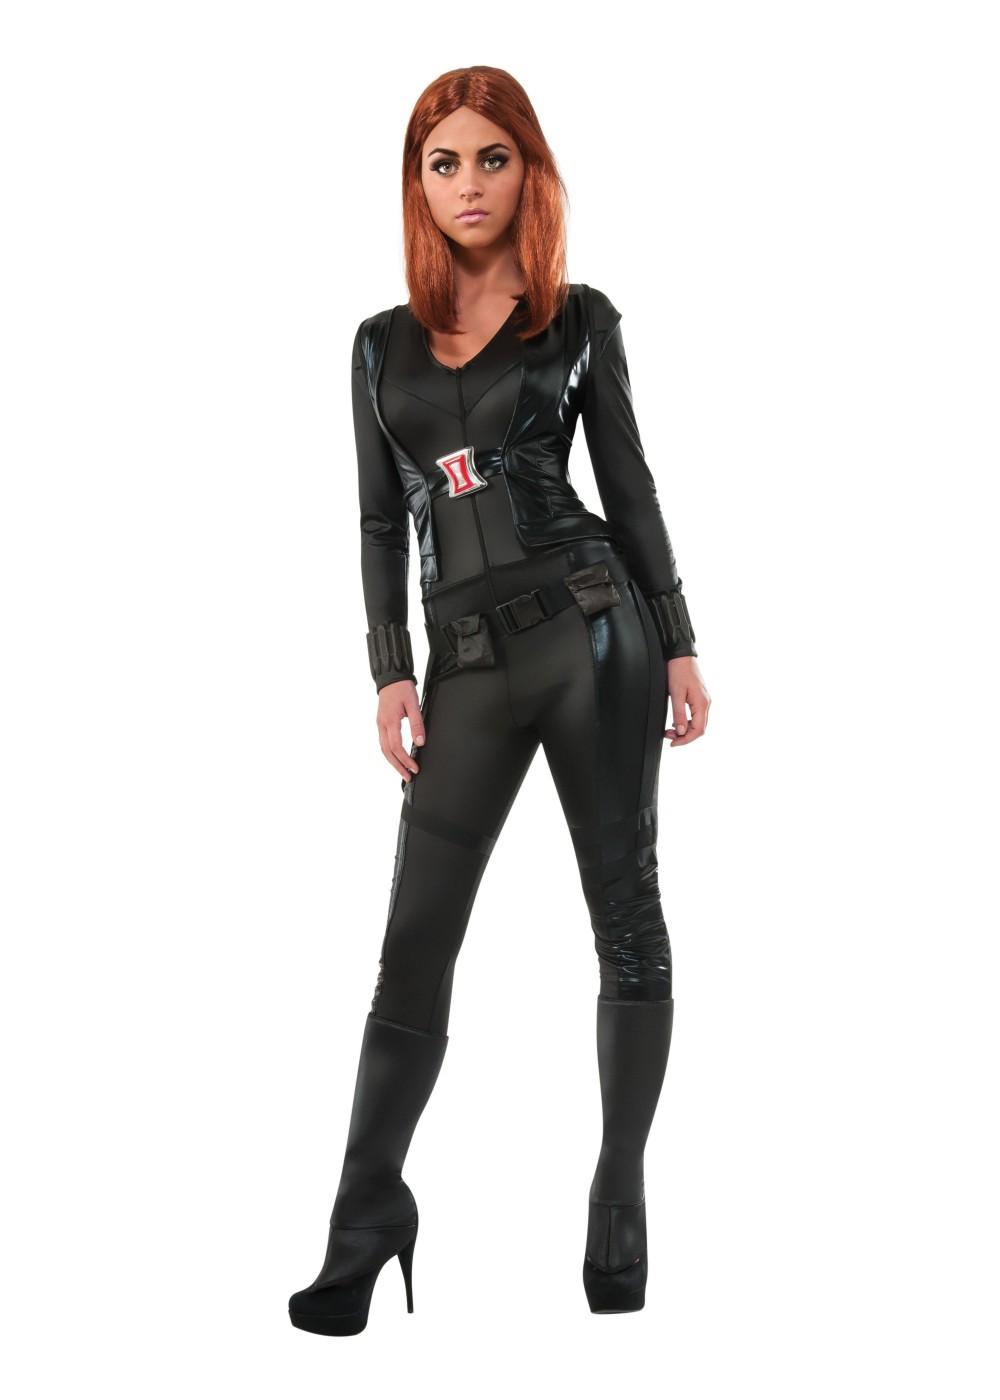 Hd Zombie Girl Wallpaper Black Widow Women S Costume Women Costume